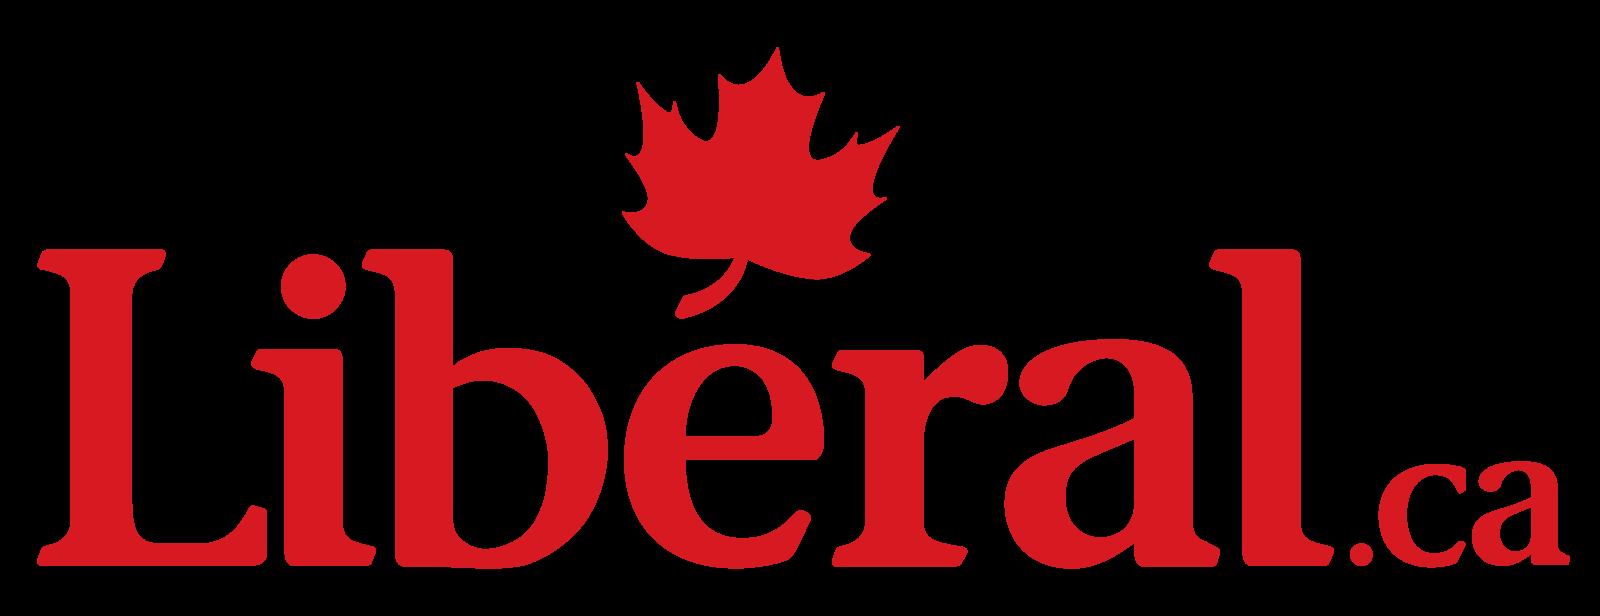 URL-logo-red